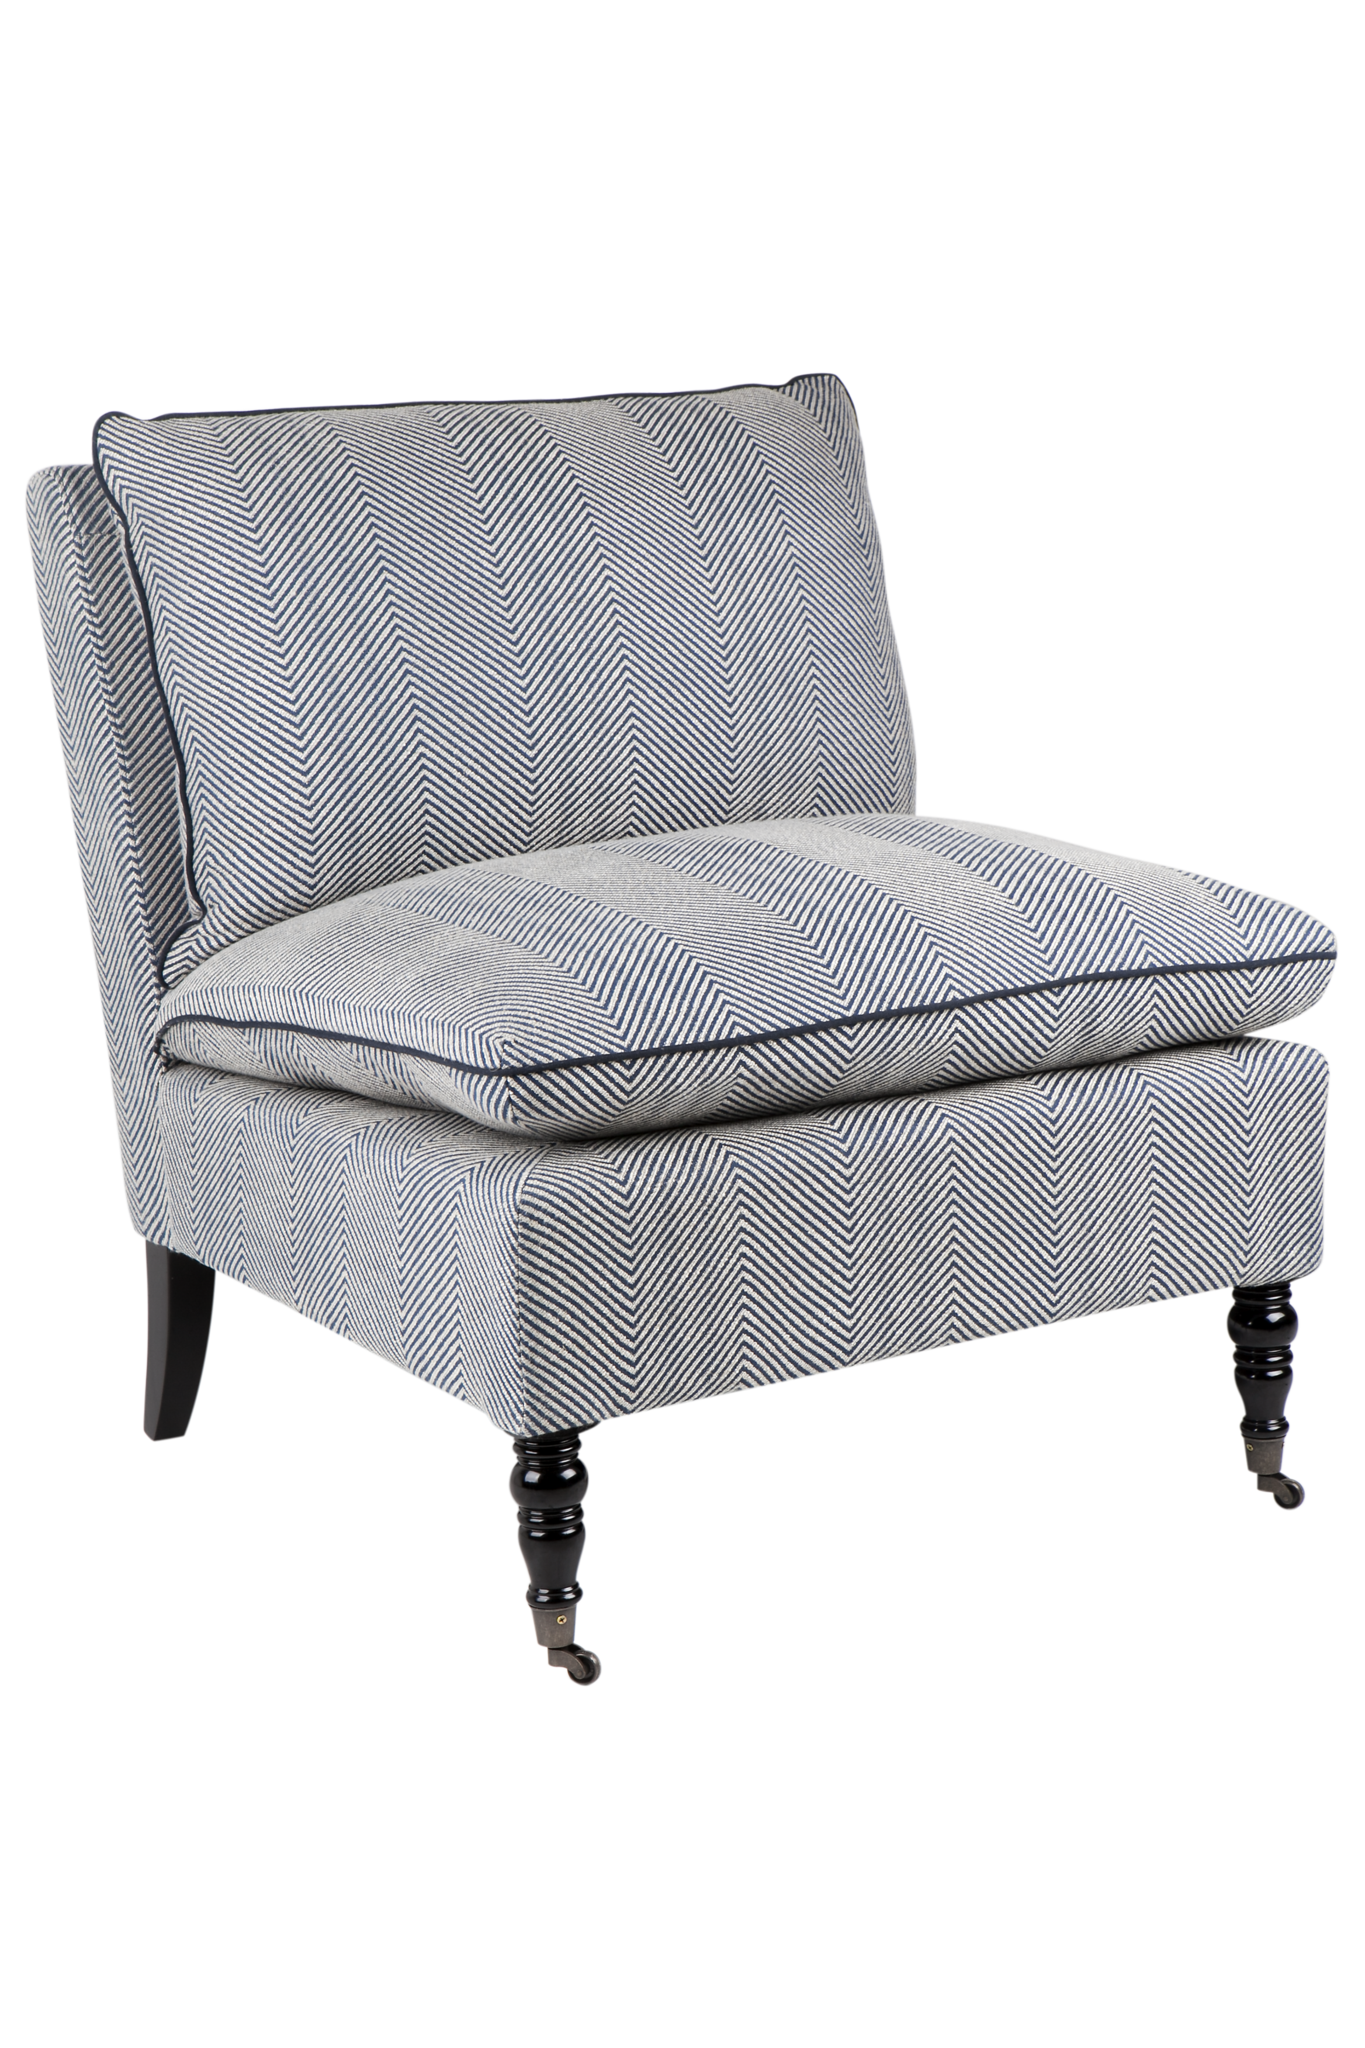 Candace Occasional Chair   Blue U0026 White Chevron U2013 Allissias Attic U0026 Vintage  French Style